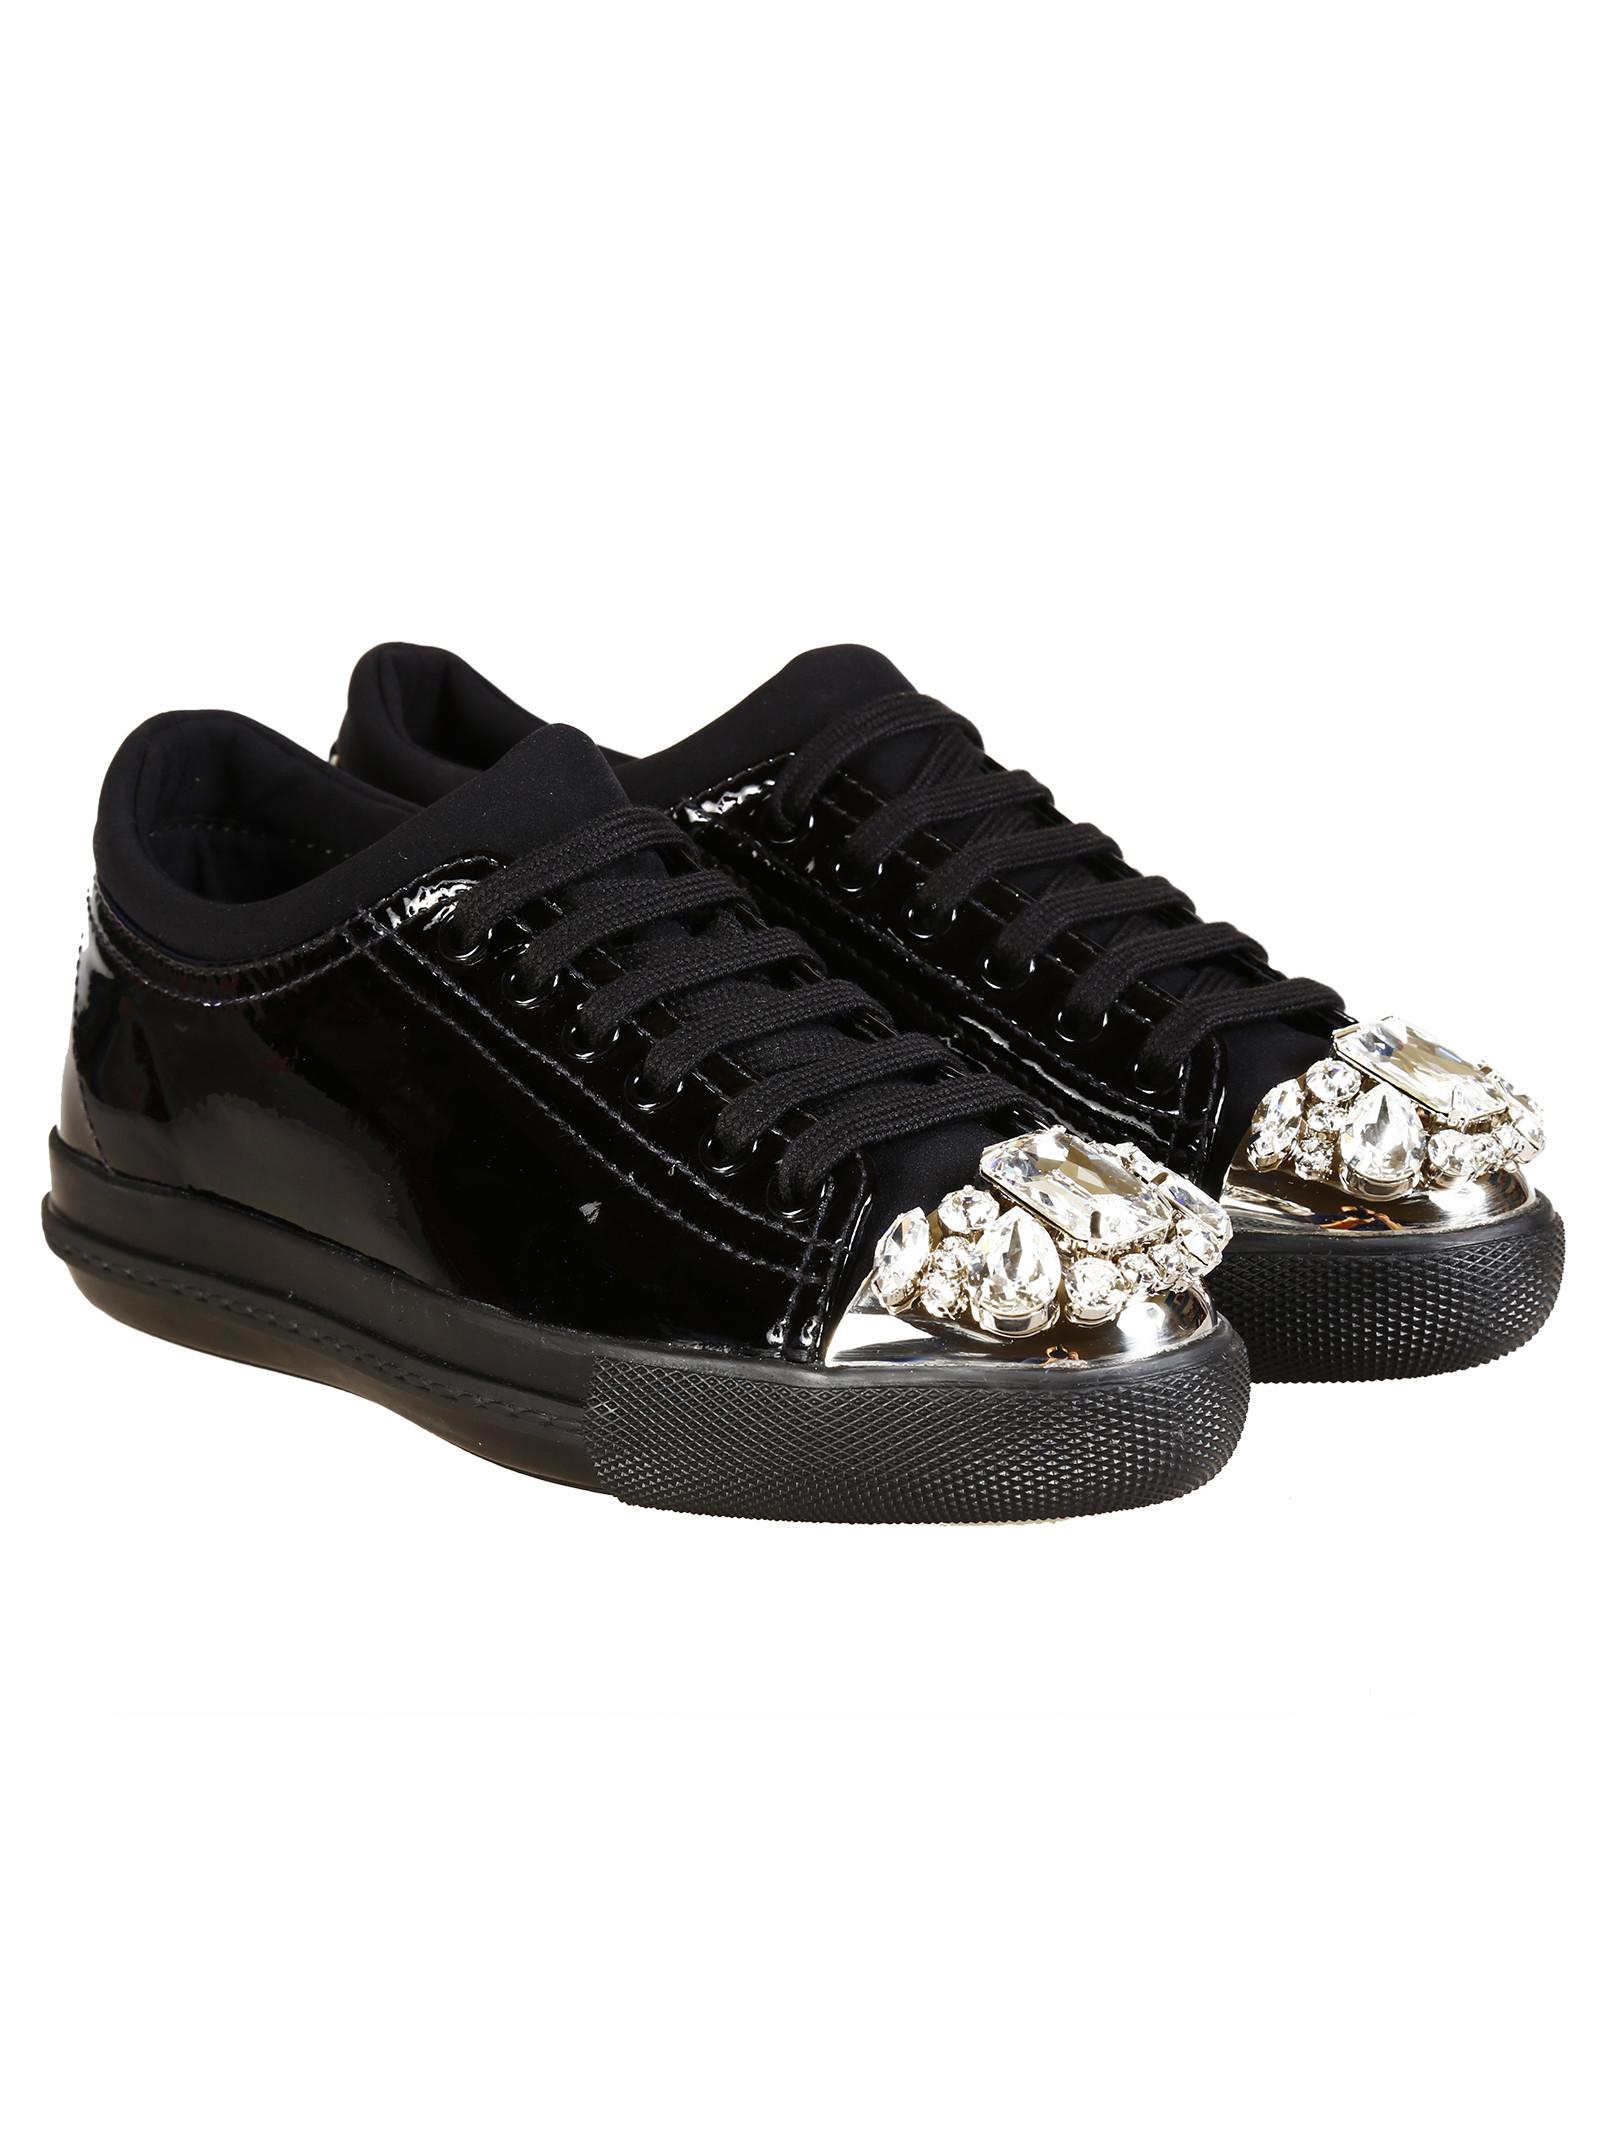 miu miu embellished sneakers in black lyst. Black Bedroom Furniture Sets. Home Design Ideas